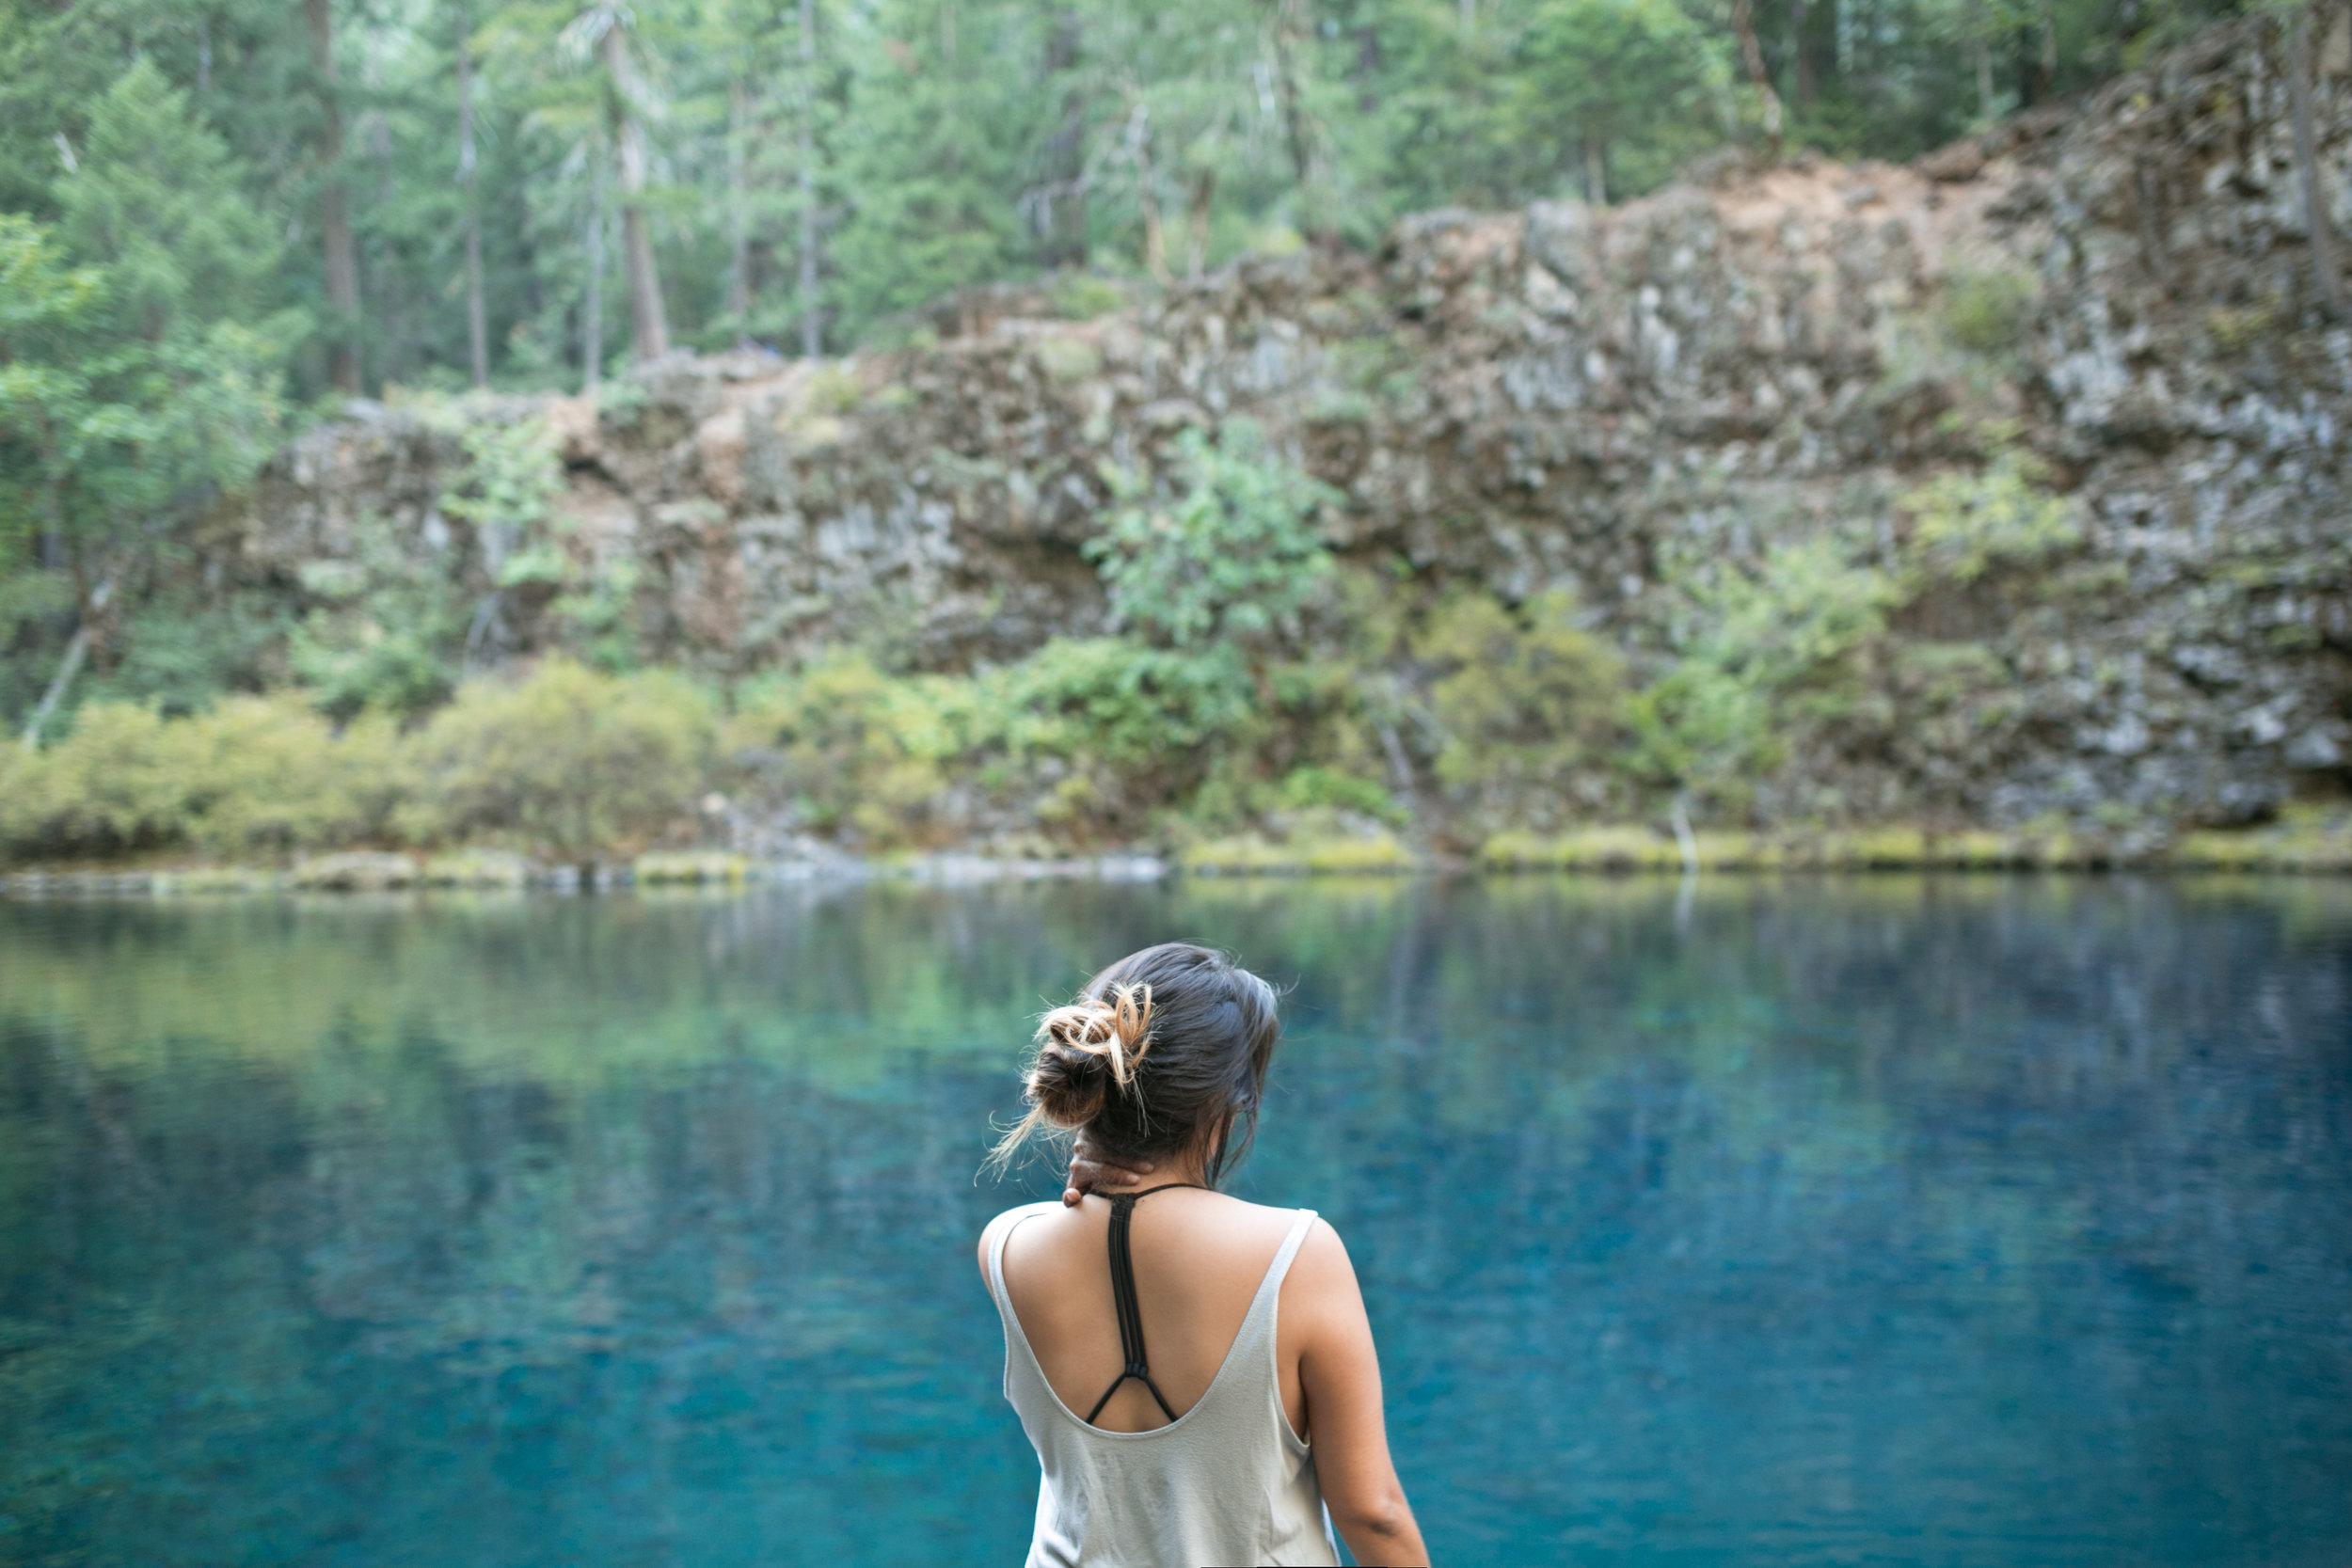 028Travel_Adventure_Photography_Outlive_Creative_Oregon_Tamolitch_Blue_Pool.jpg